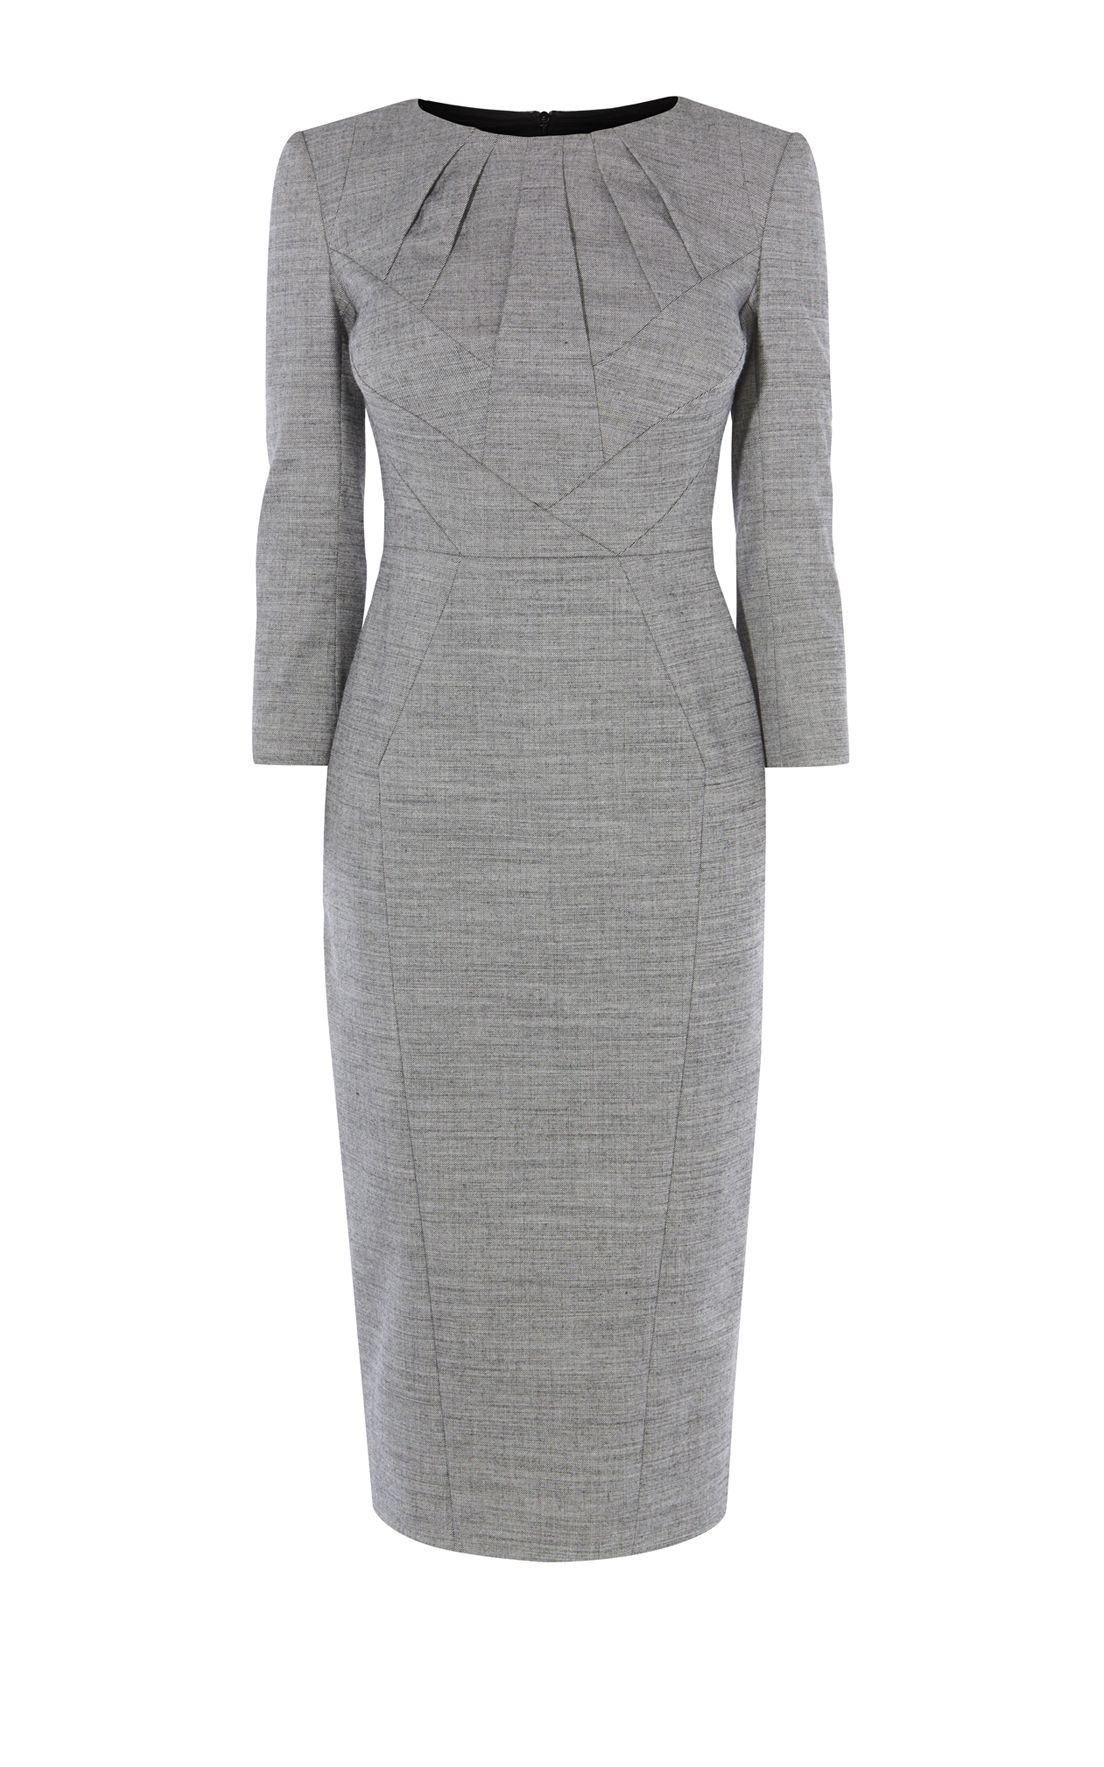 Black dress karen millen - Karen Millen Tailored Dress Grey